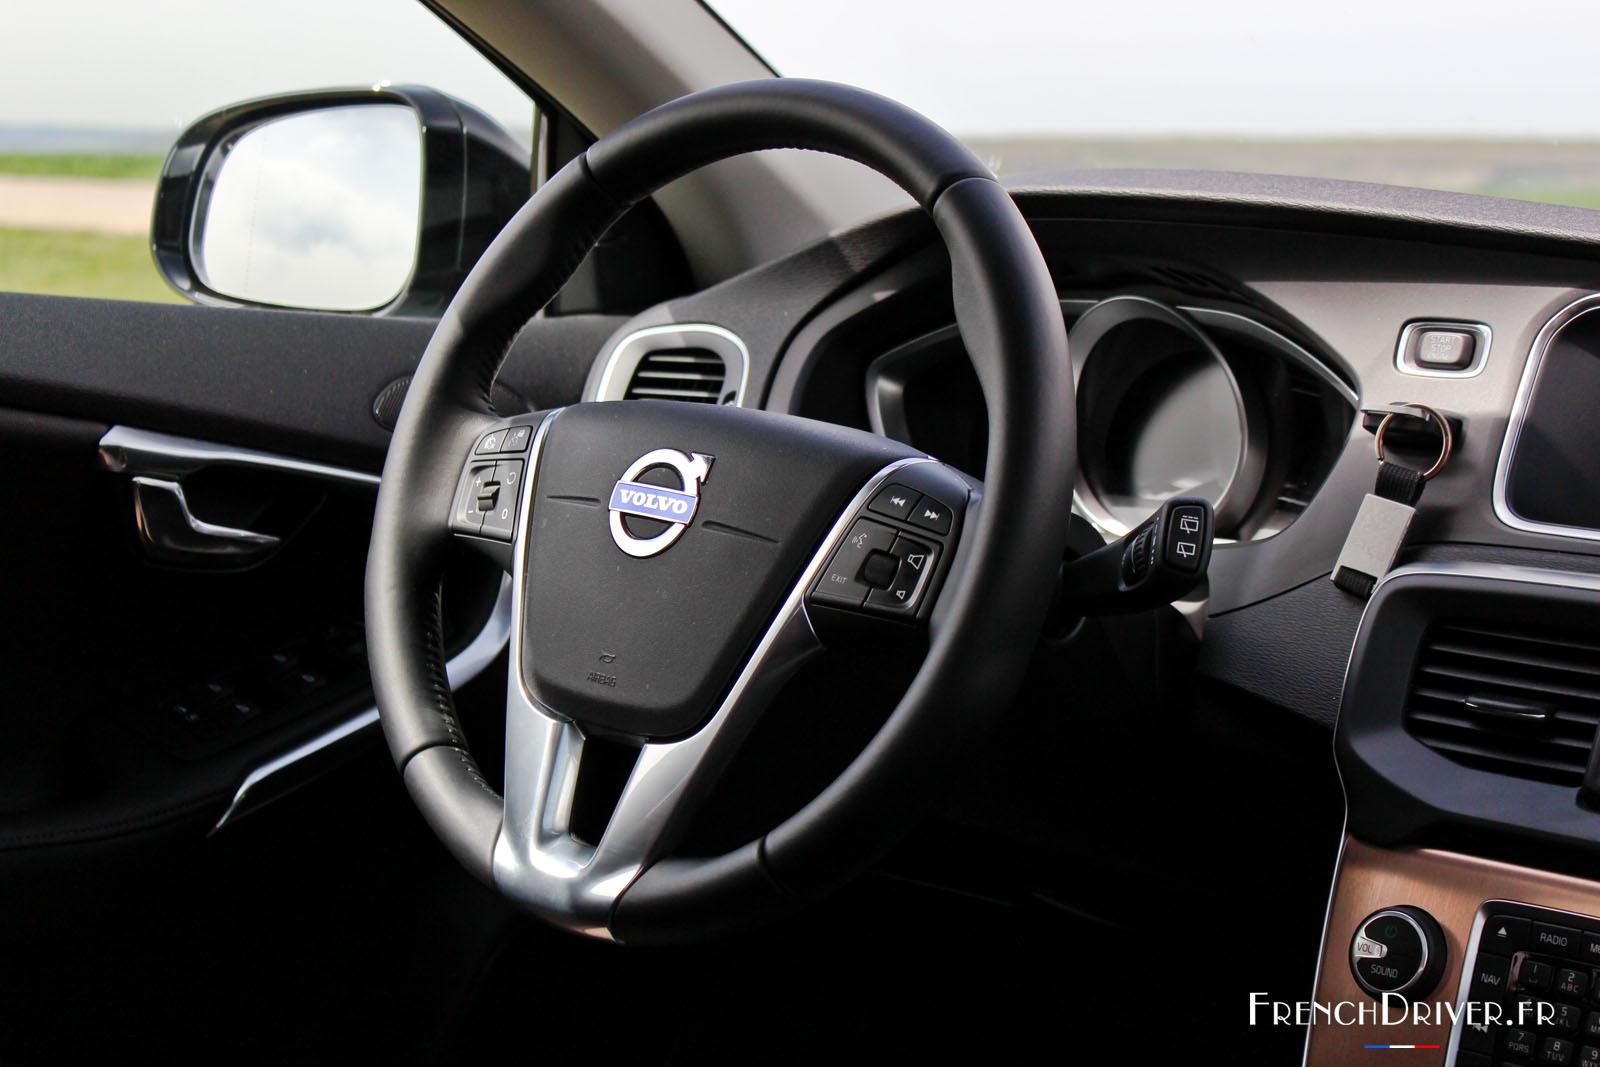 Essai de la Volvo V40 Cross Country T5 AWD - French Driver